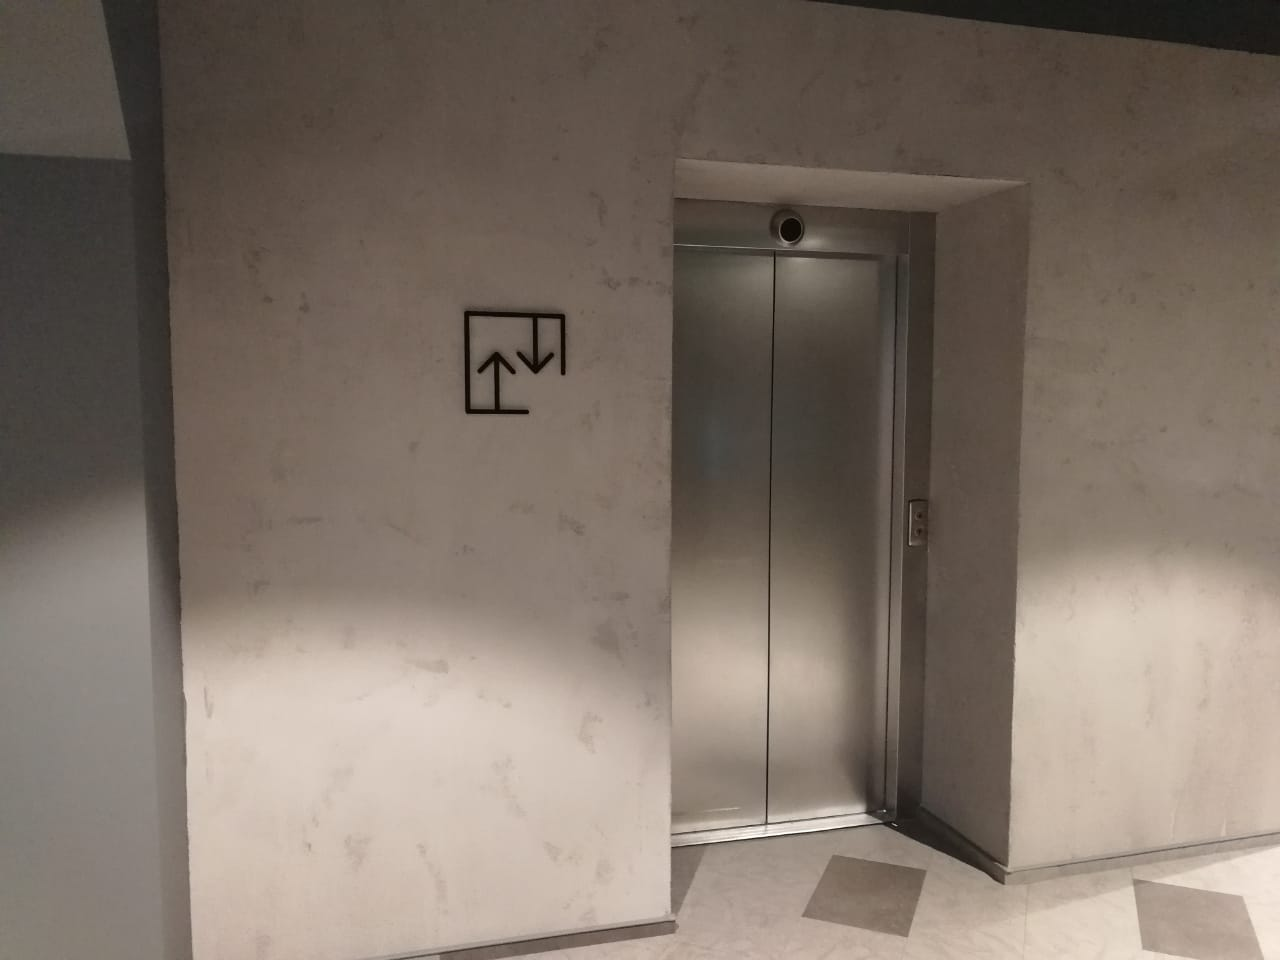 Обозначение лифта в офисе компании 'Петер-сервис'